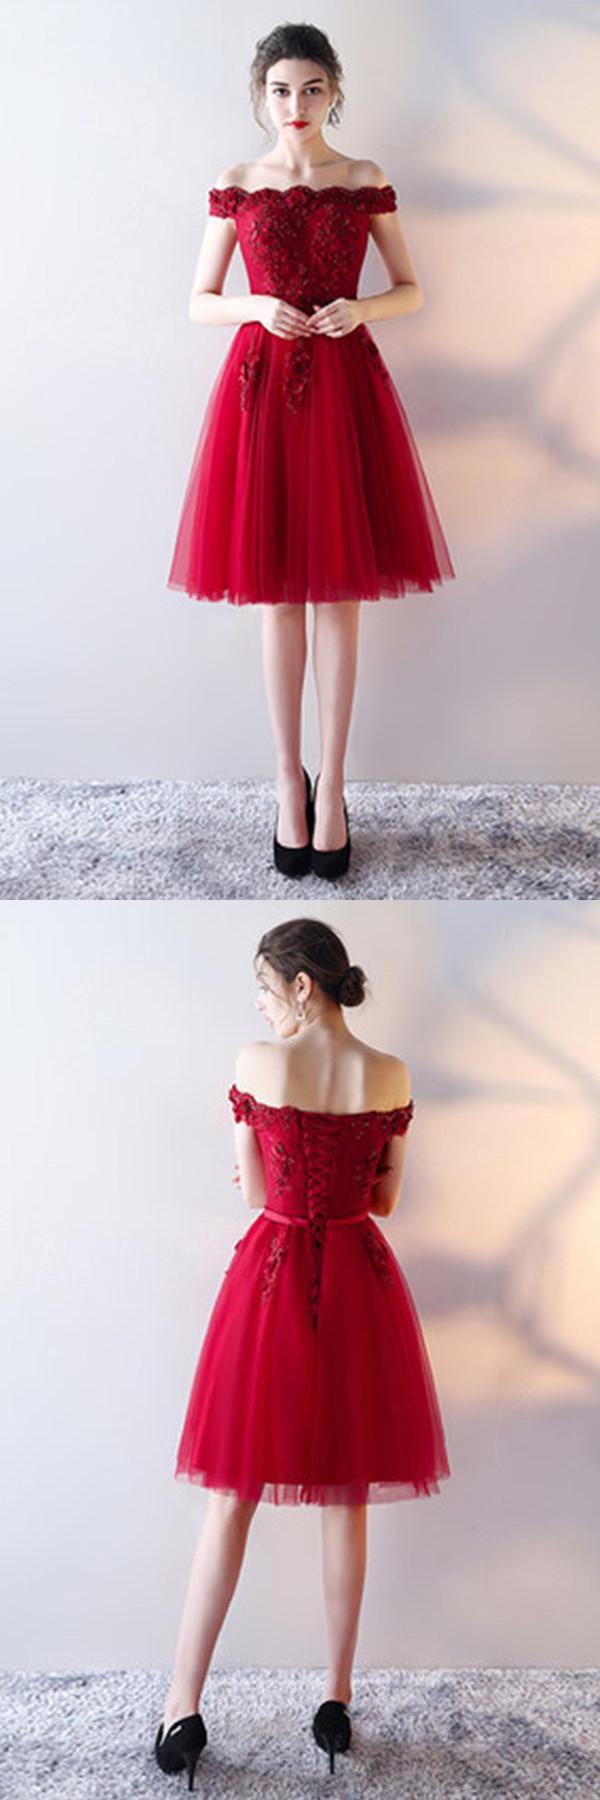 Red homecoming dressessleeveless prom dresslace homecoming dress